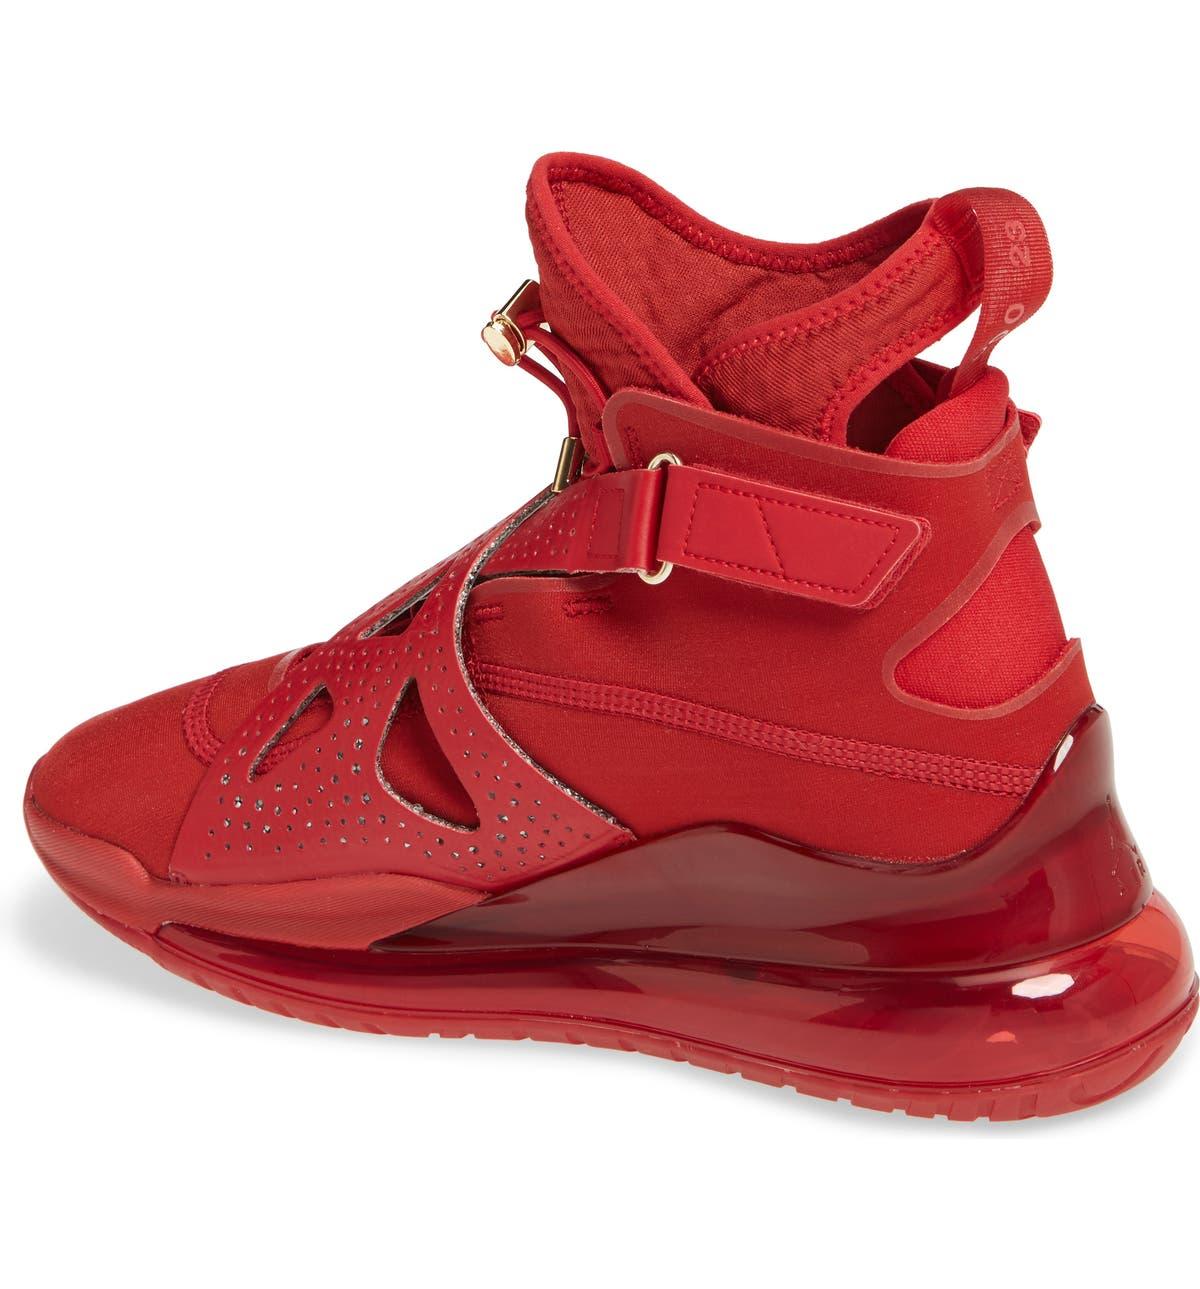 Jordan Air Latitude 720 LX Swarovski High Top Sneaker (Women